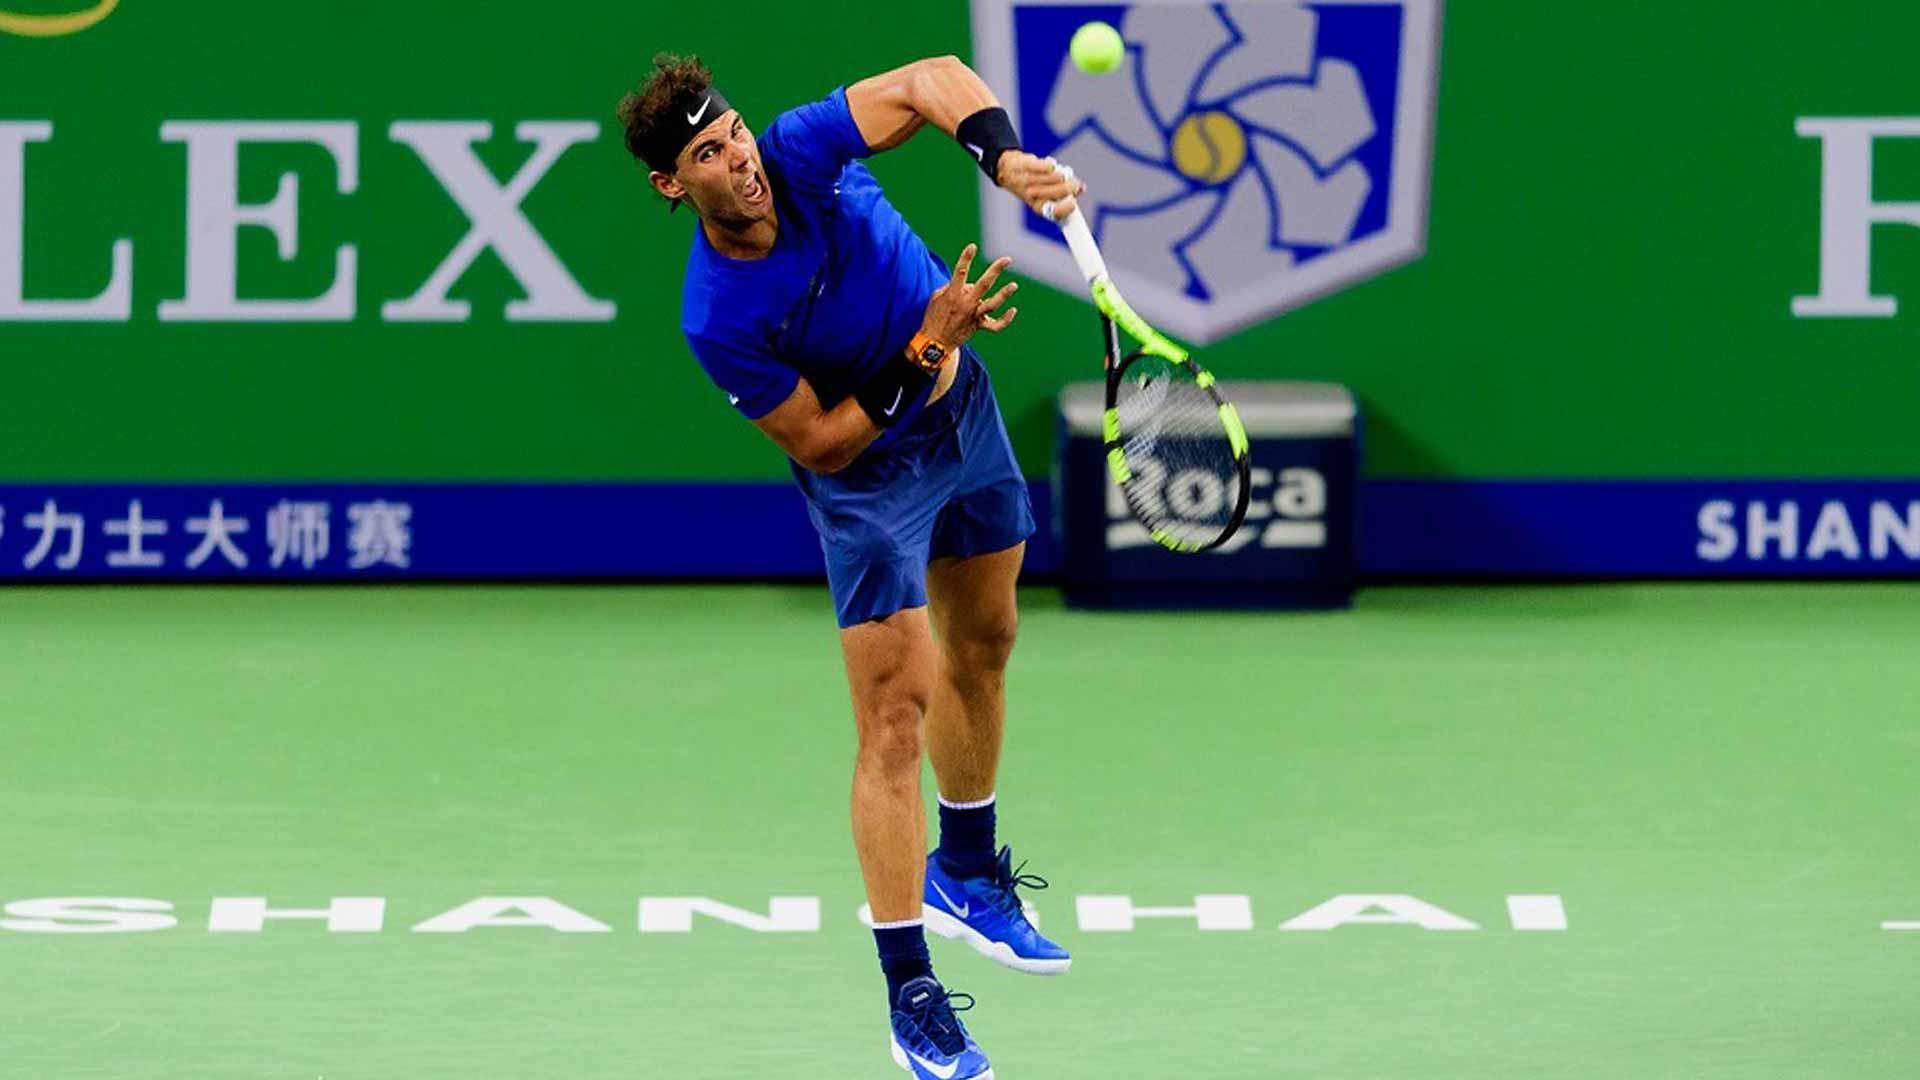 Rafael Nadal ATP Rolex Masters Shanghai 2017